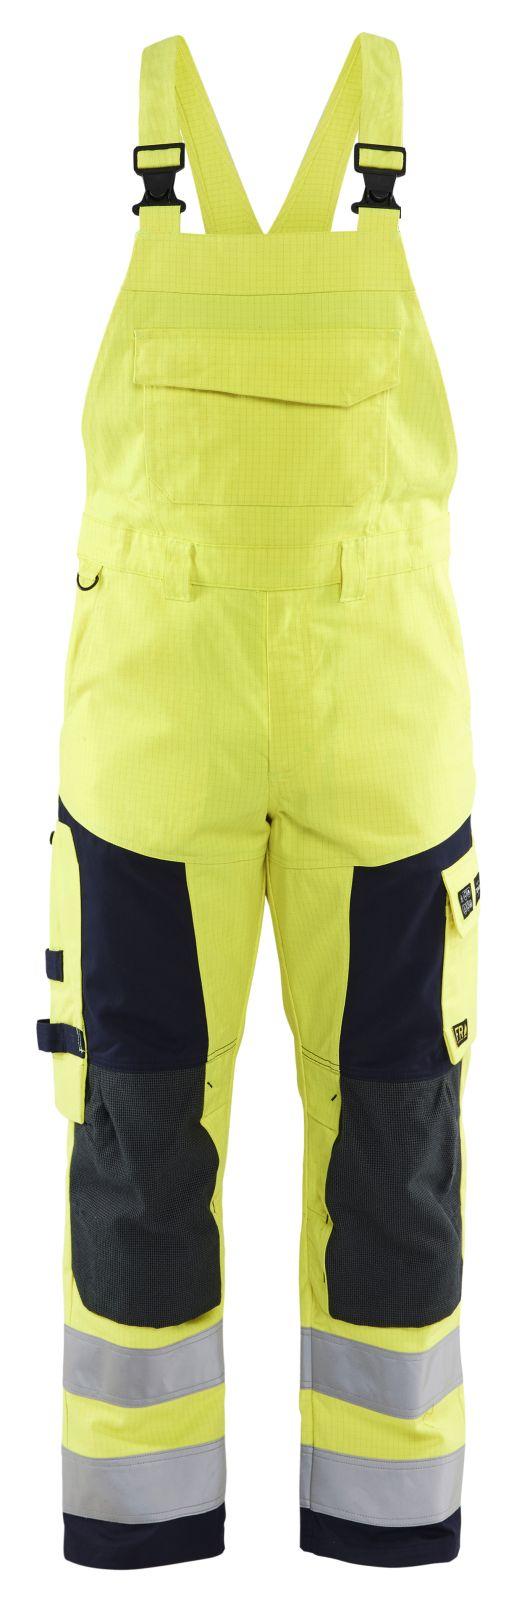 Blaklader Amerikaanse overalls 26081514 Multinorm geel-marineblauw(3389)